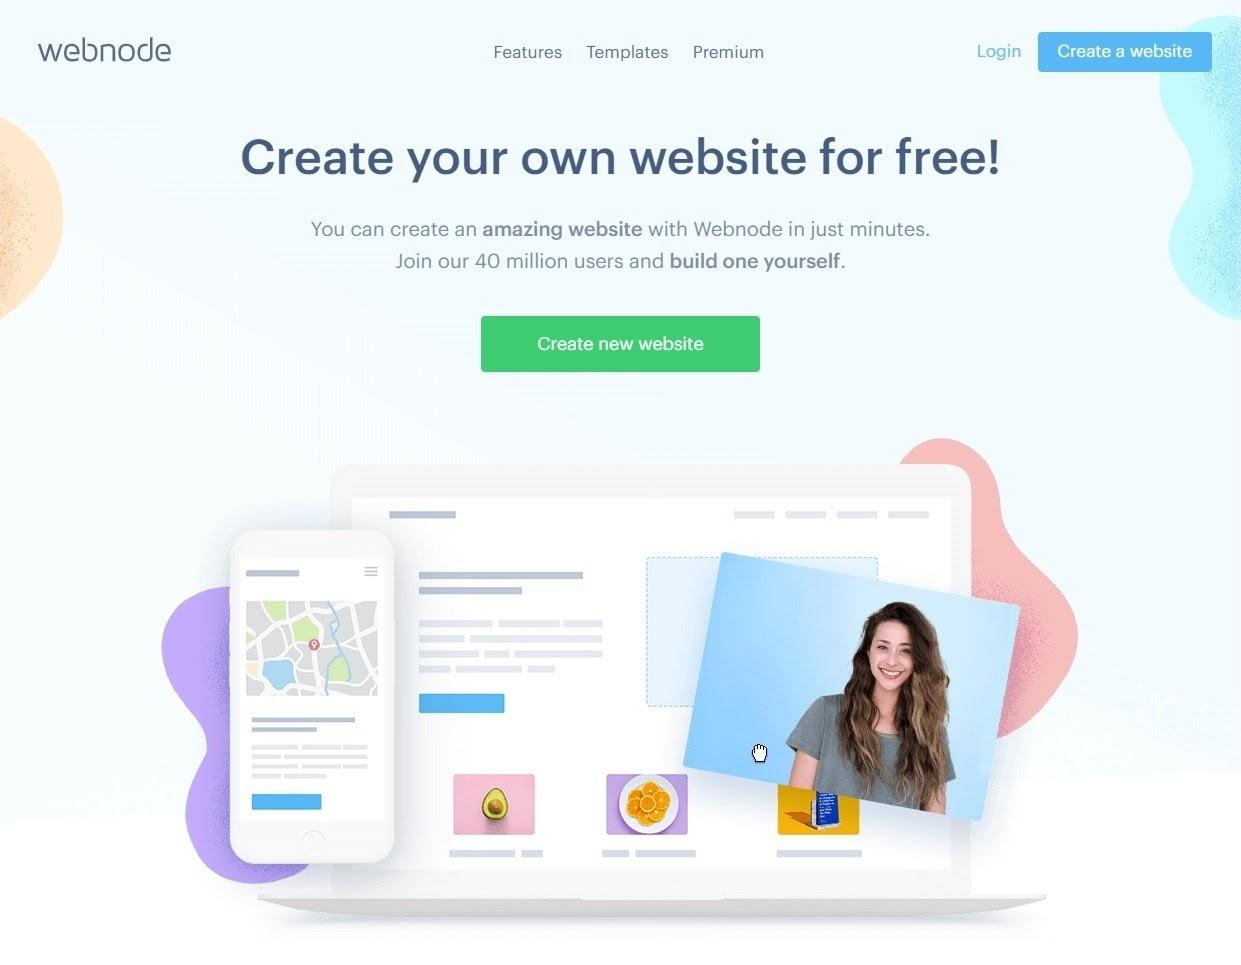 10 Best Completely Free Website Builders In September 2020